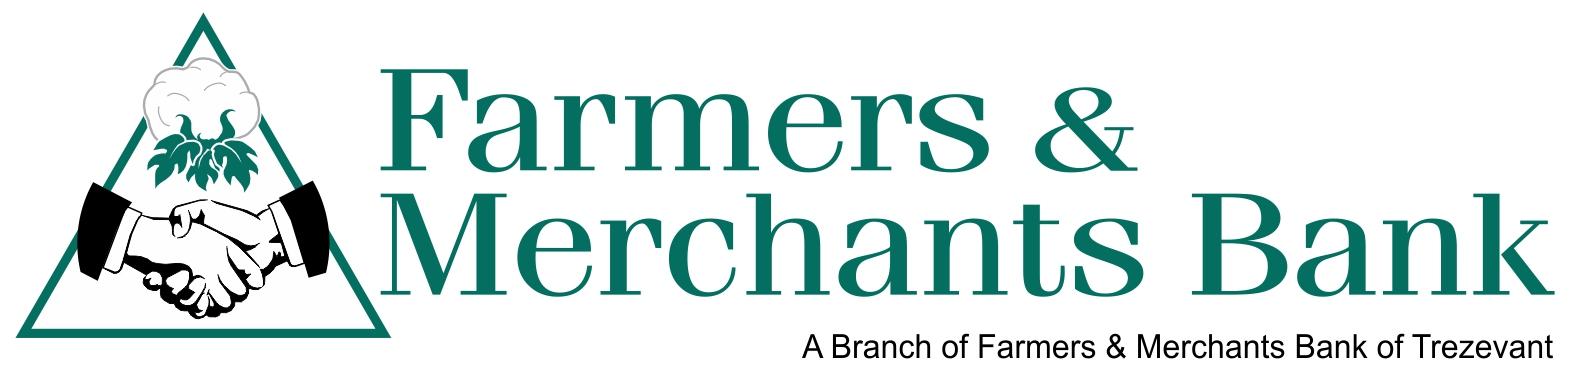 farmers merchants bank by larry elliott design. Black Bedroom Furniture Sets. Home Design Ideas